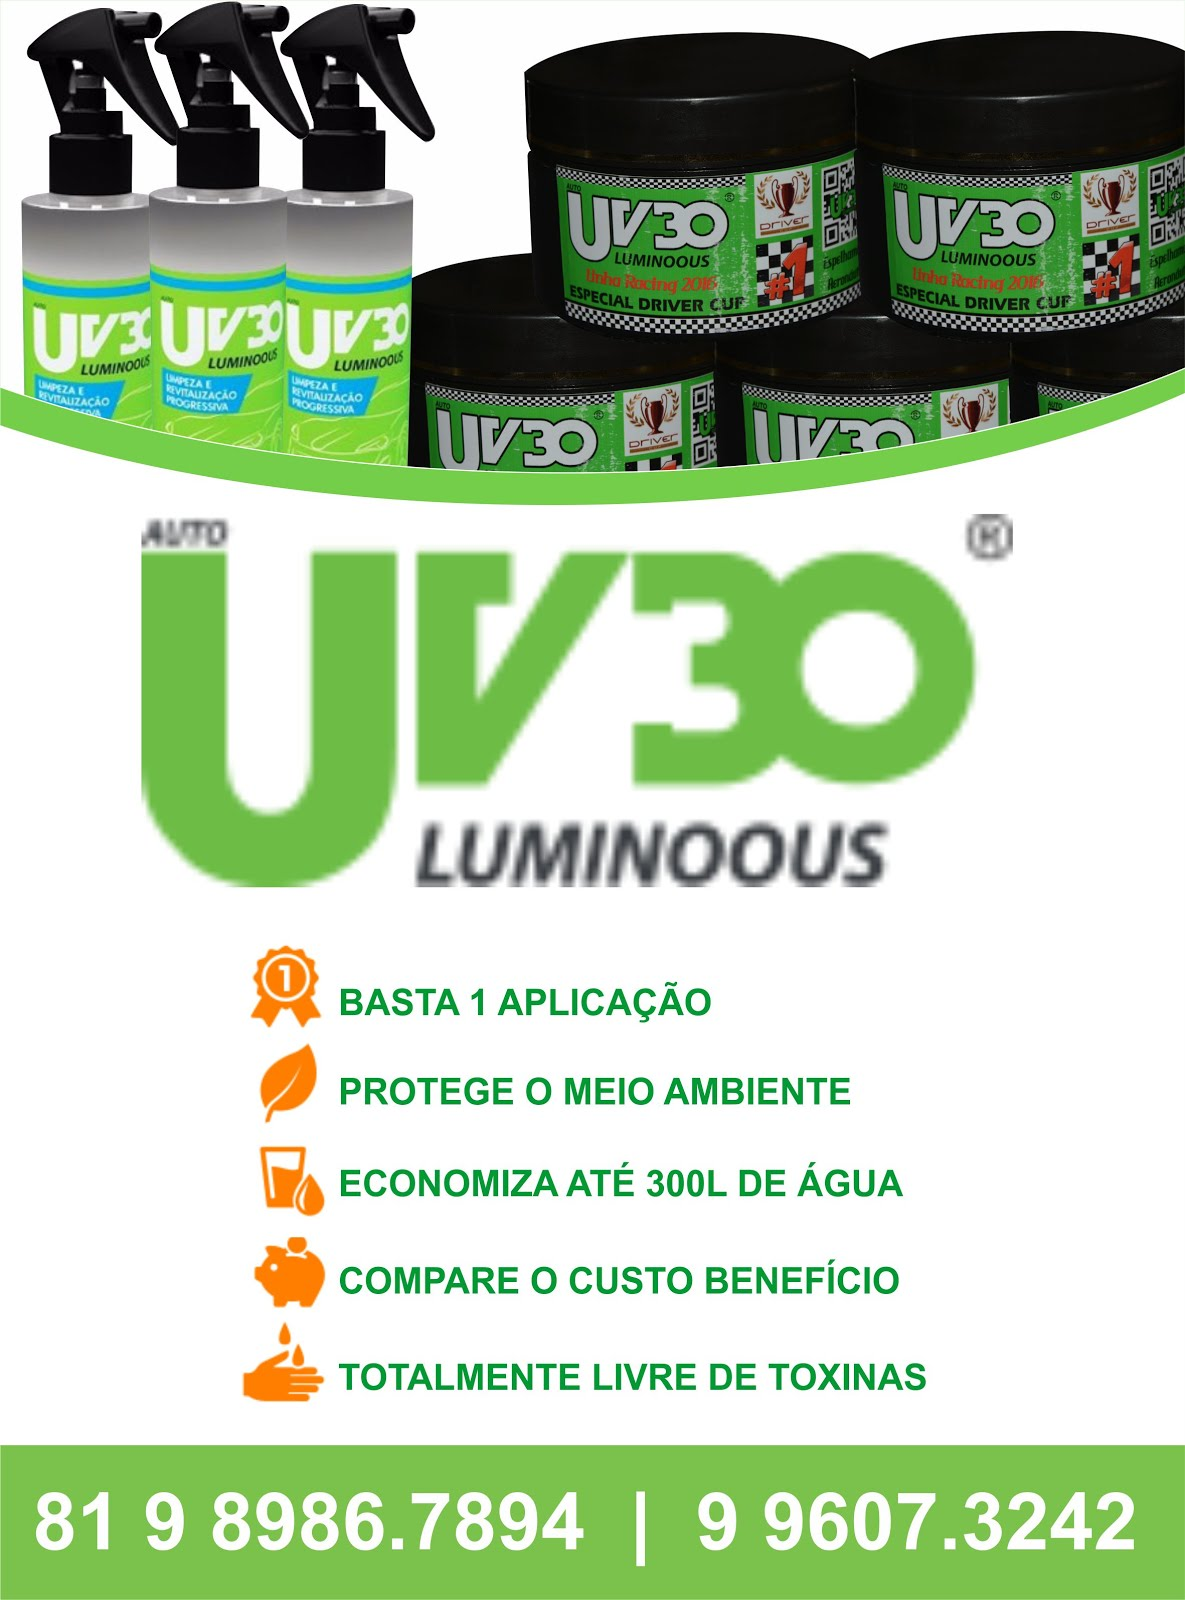 Publicidade - Auto UV30 Luminoous